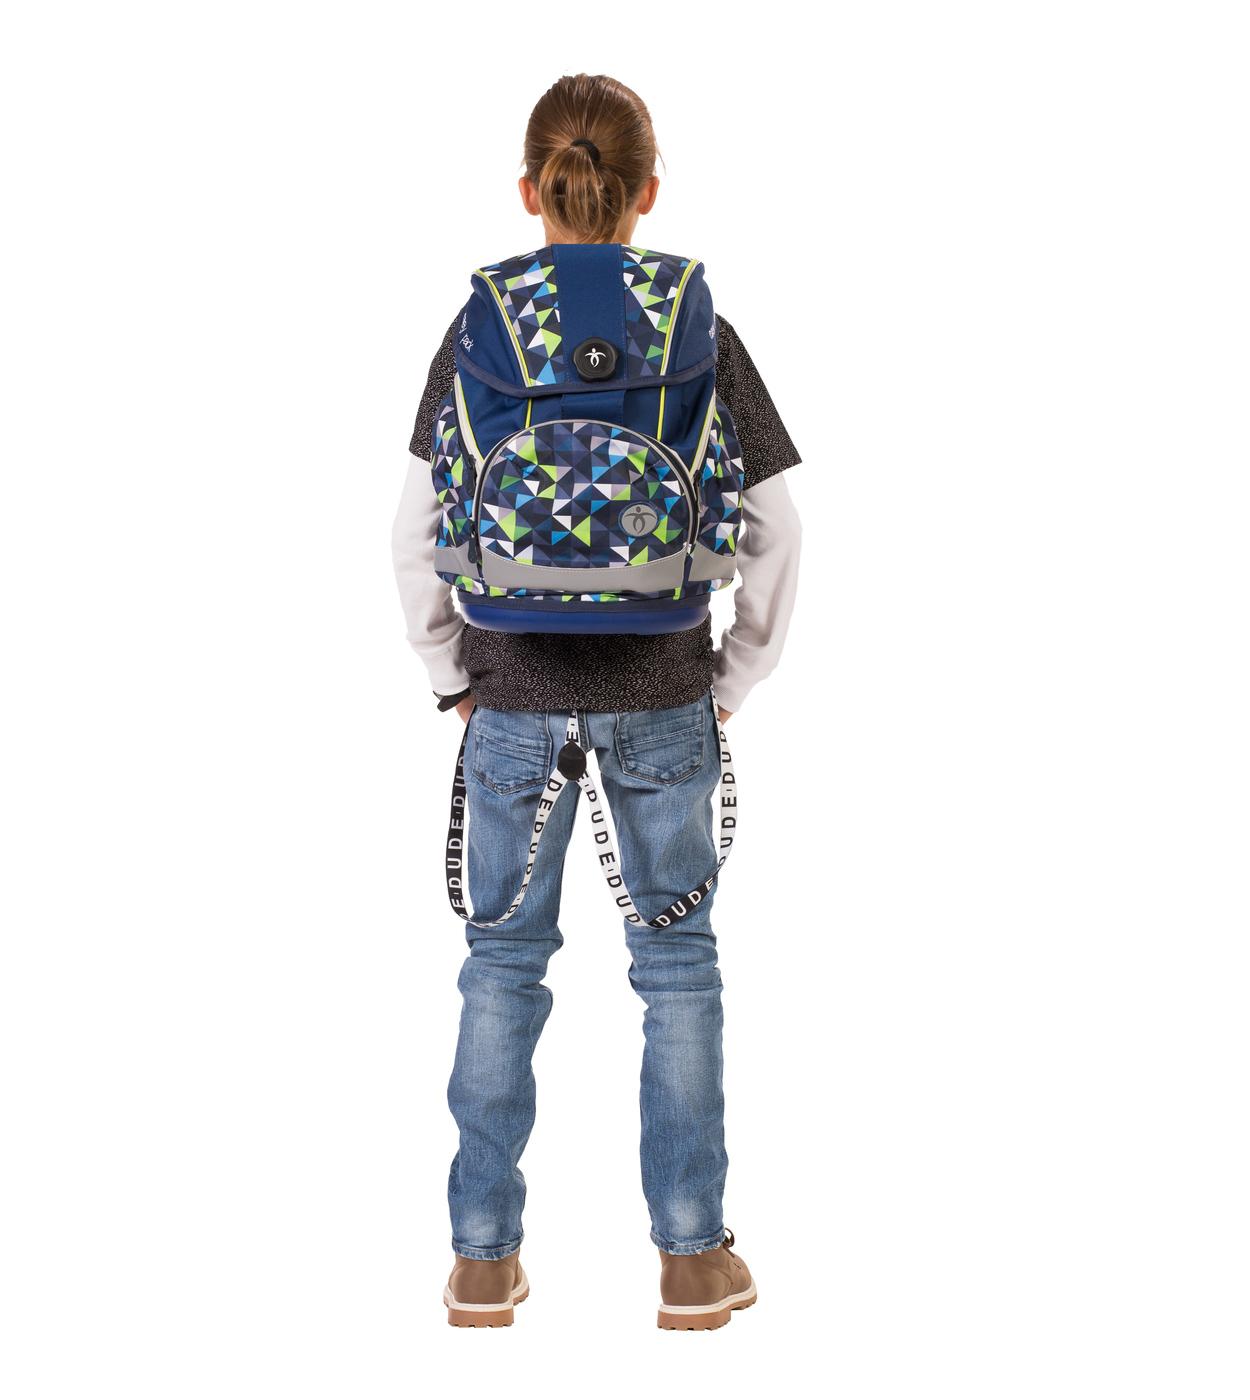 Ранец Belmil EASY PACK 404-40 BLUE PACK + мешок, - фото 15